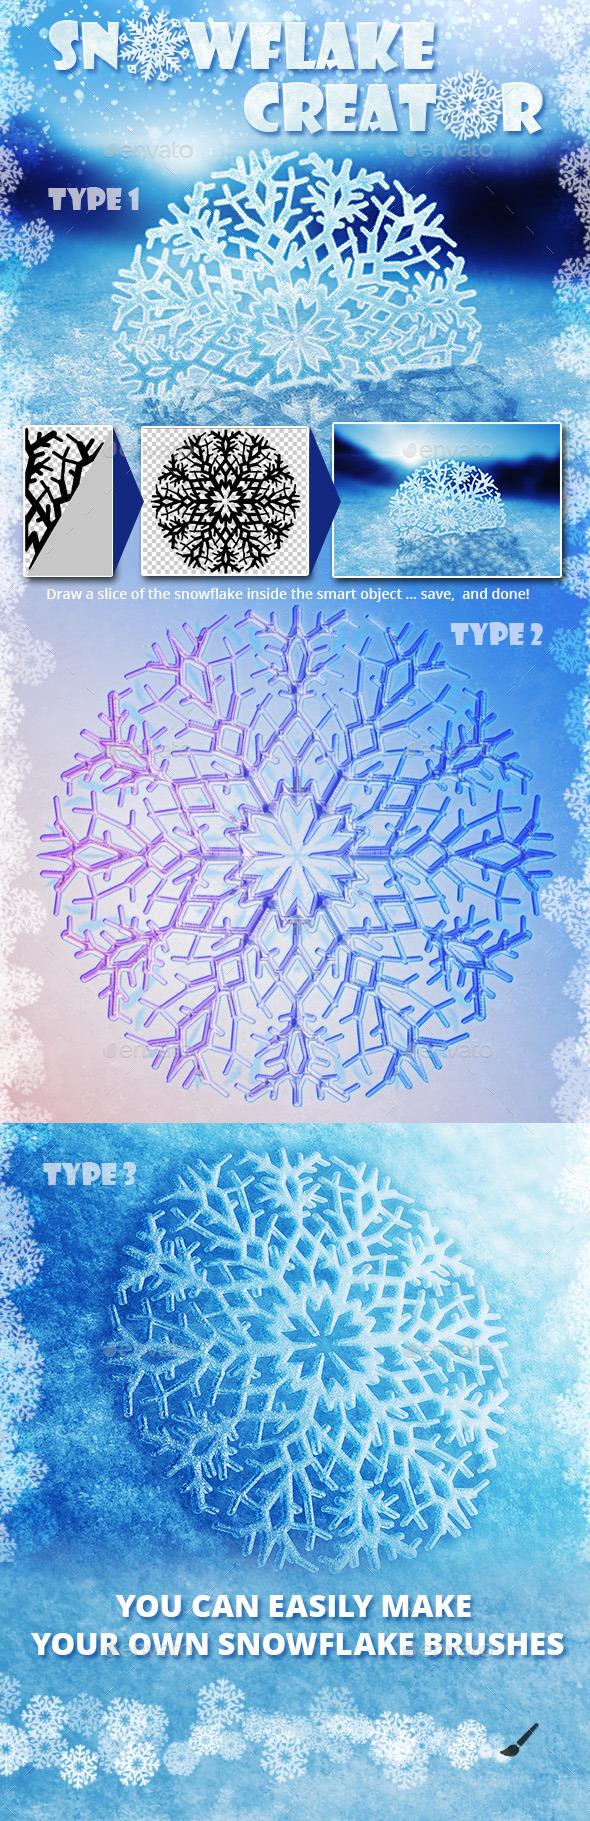 Snowflake Creator